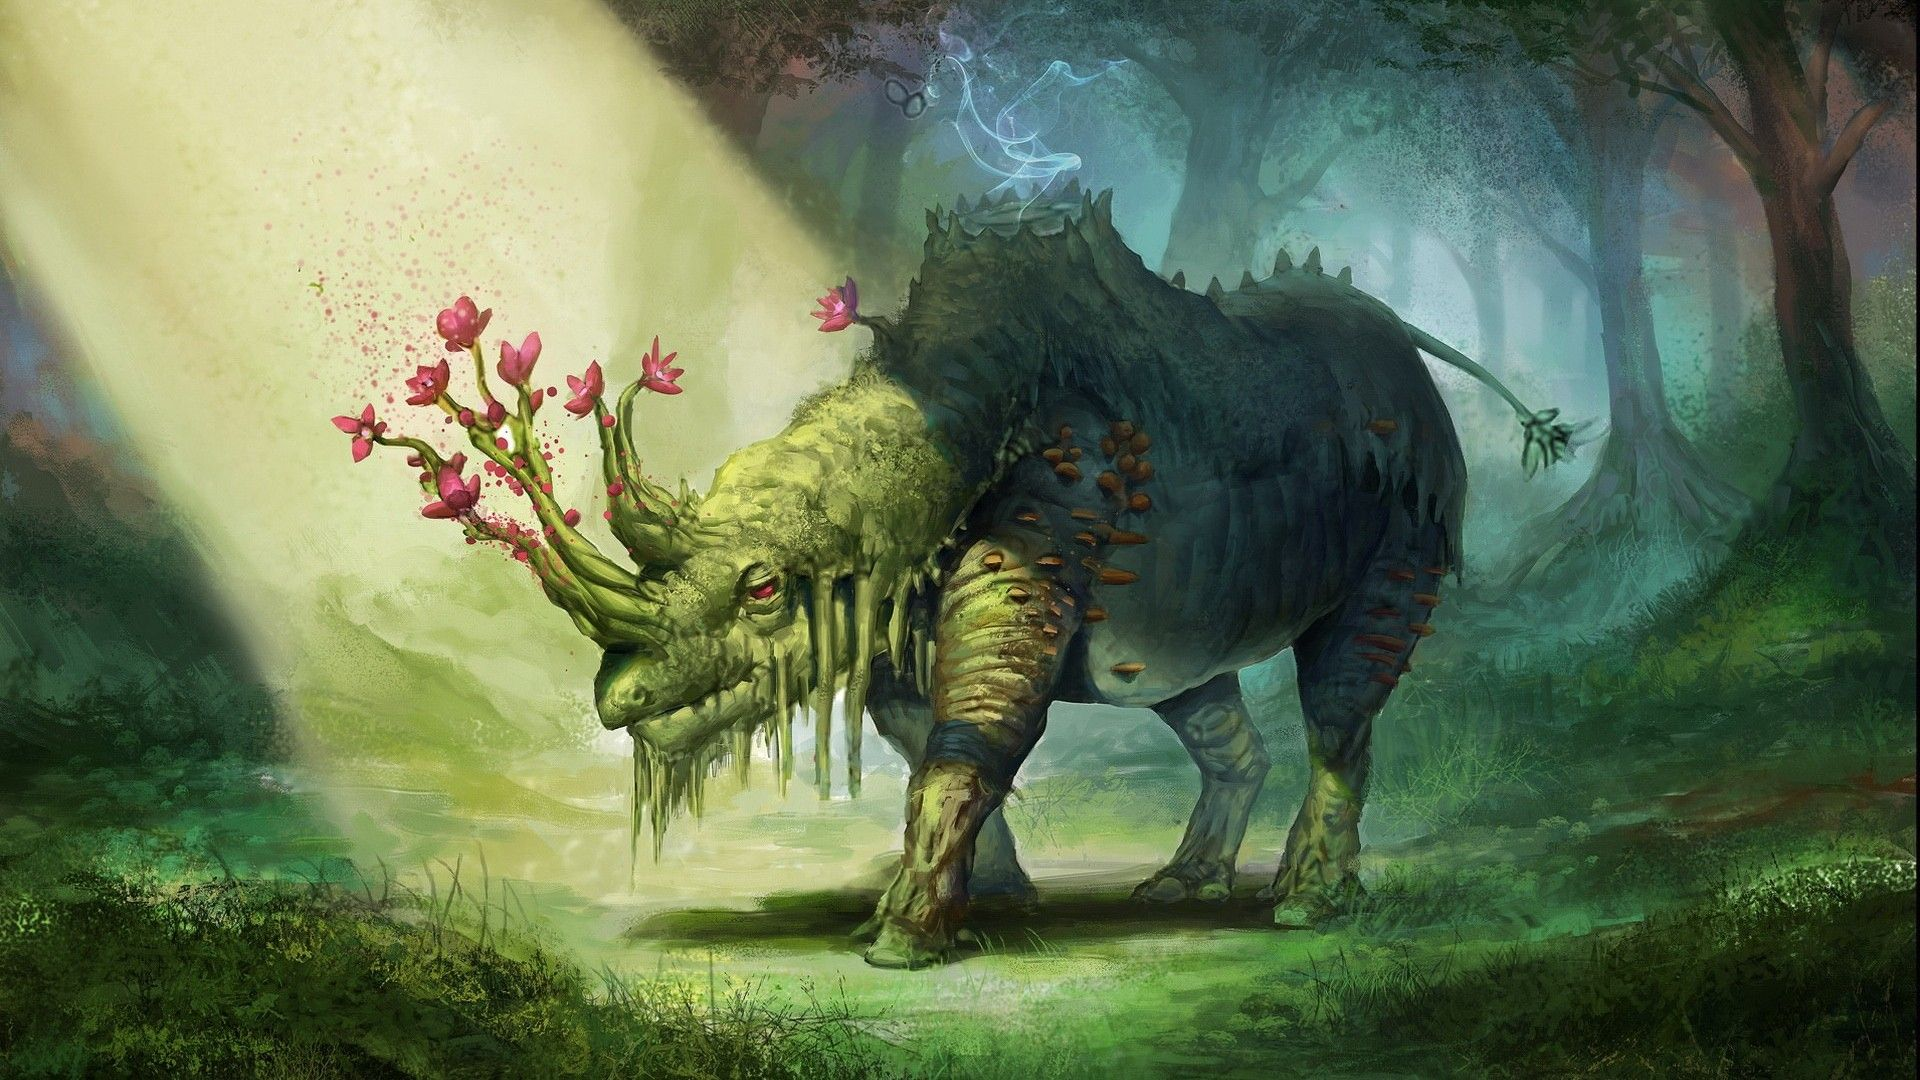 1837934 Jpg 1920 1080 Concept Art Creature Art Fantastique Art Rhinoceros